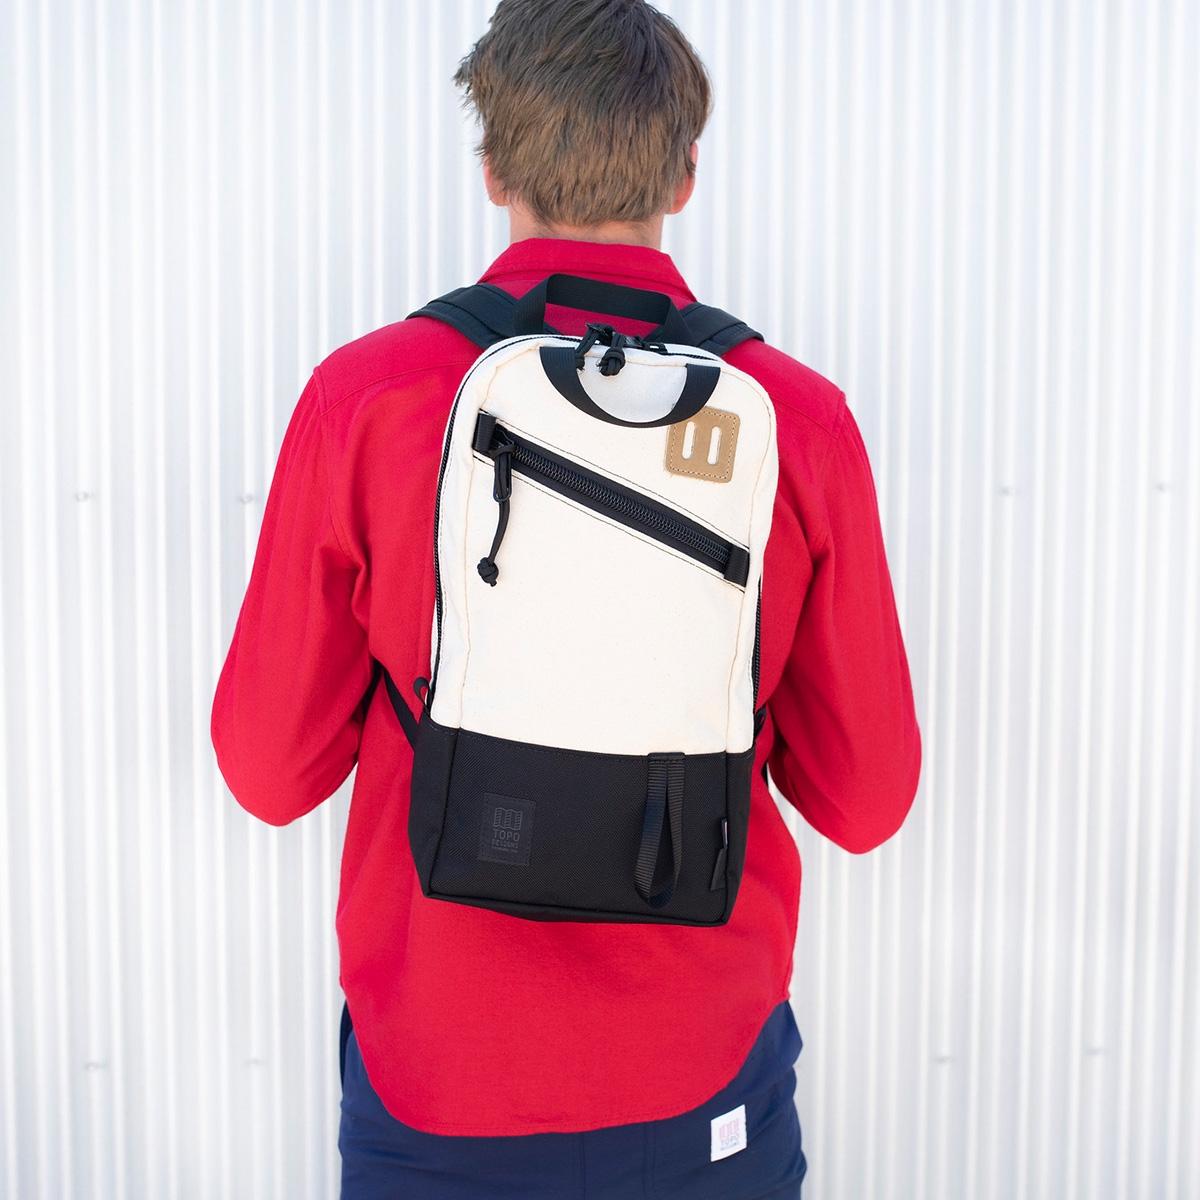 Topo Designs Trip Pack Natural/Ballistic Black, perfecte rugzak voor elke dag tocht